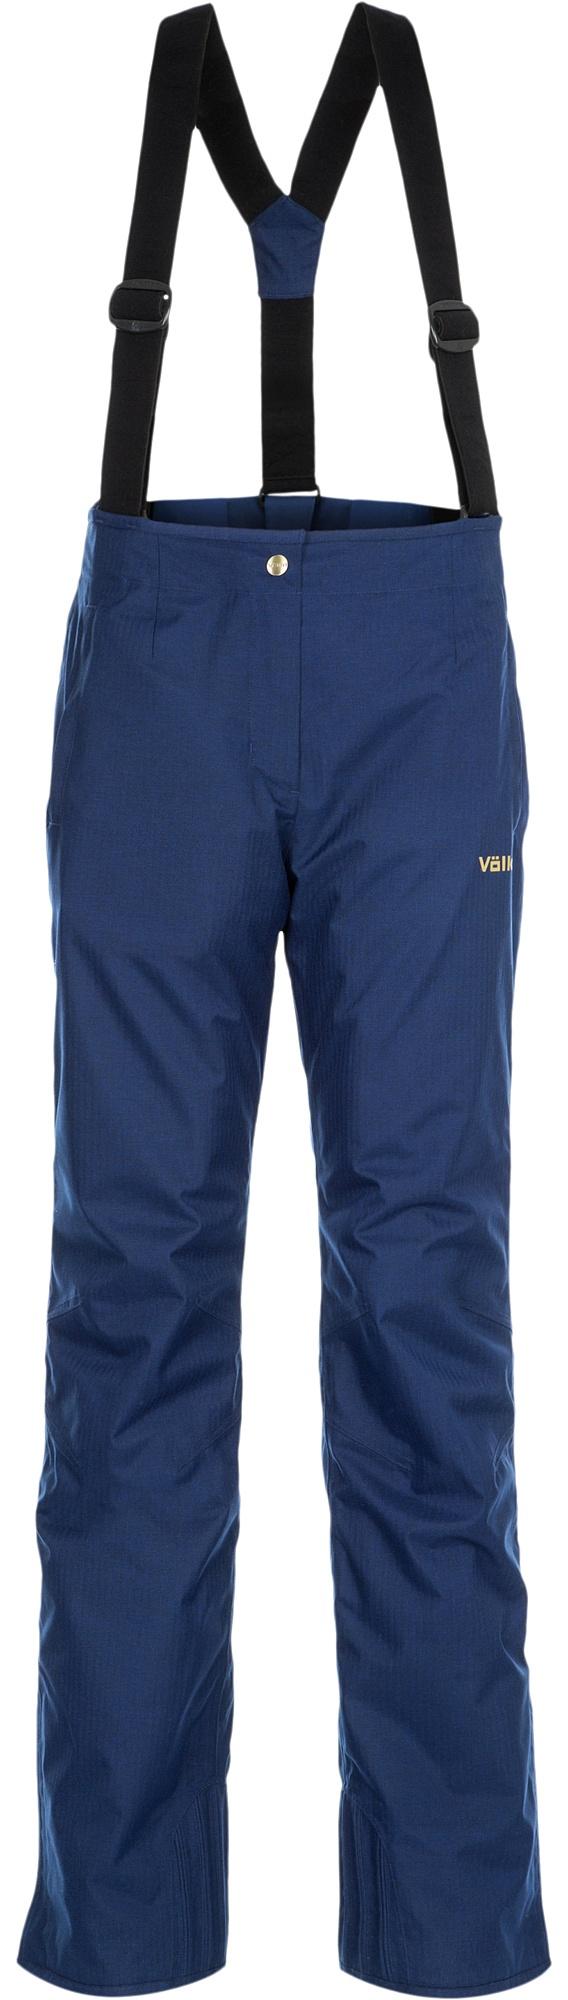 Volkl Брюки утепленные женские Volkl, размер 50 брюки утепленные женские icepeak цвет темно синий 854020542iv 390 размер 34 40